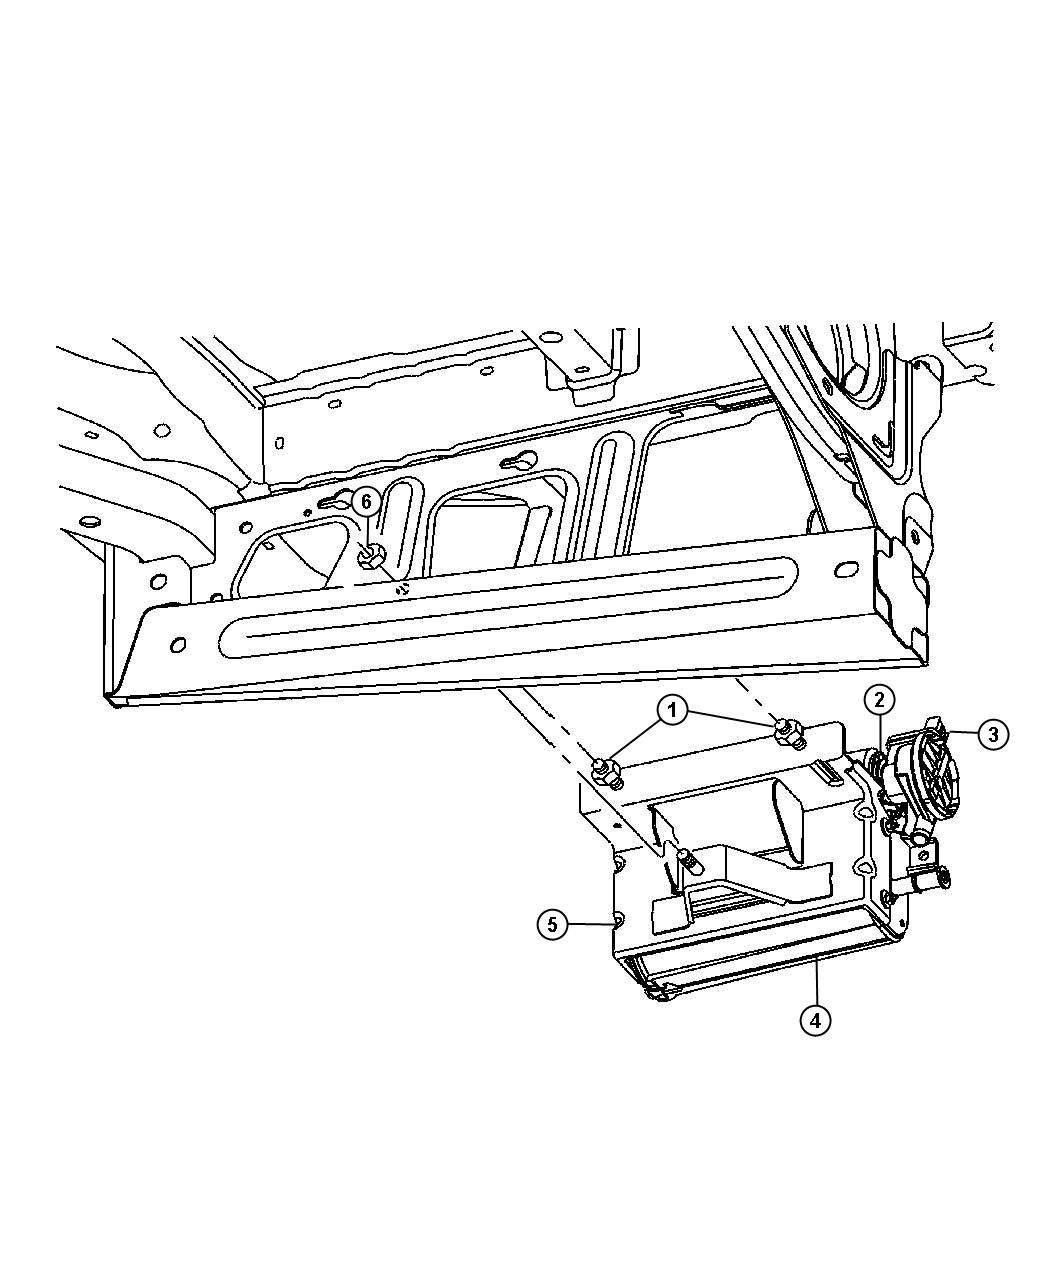 2005 Dodge Ram 1500 Filter. Fuel vapor vent, leak